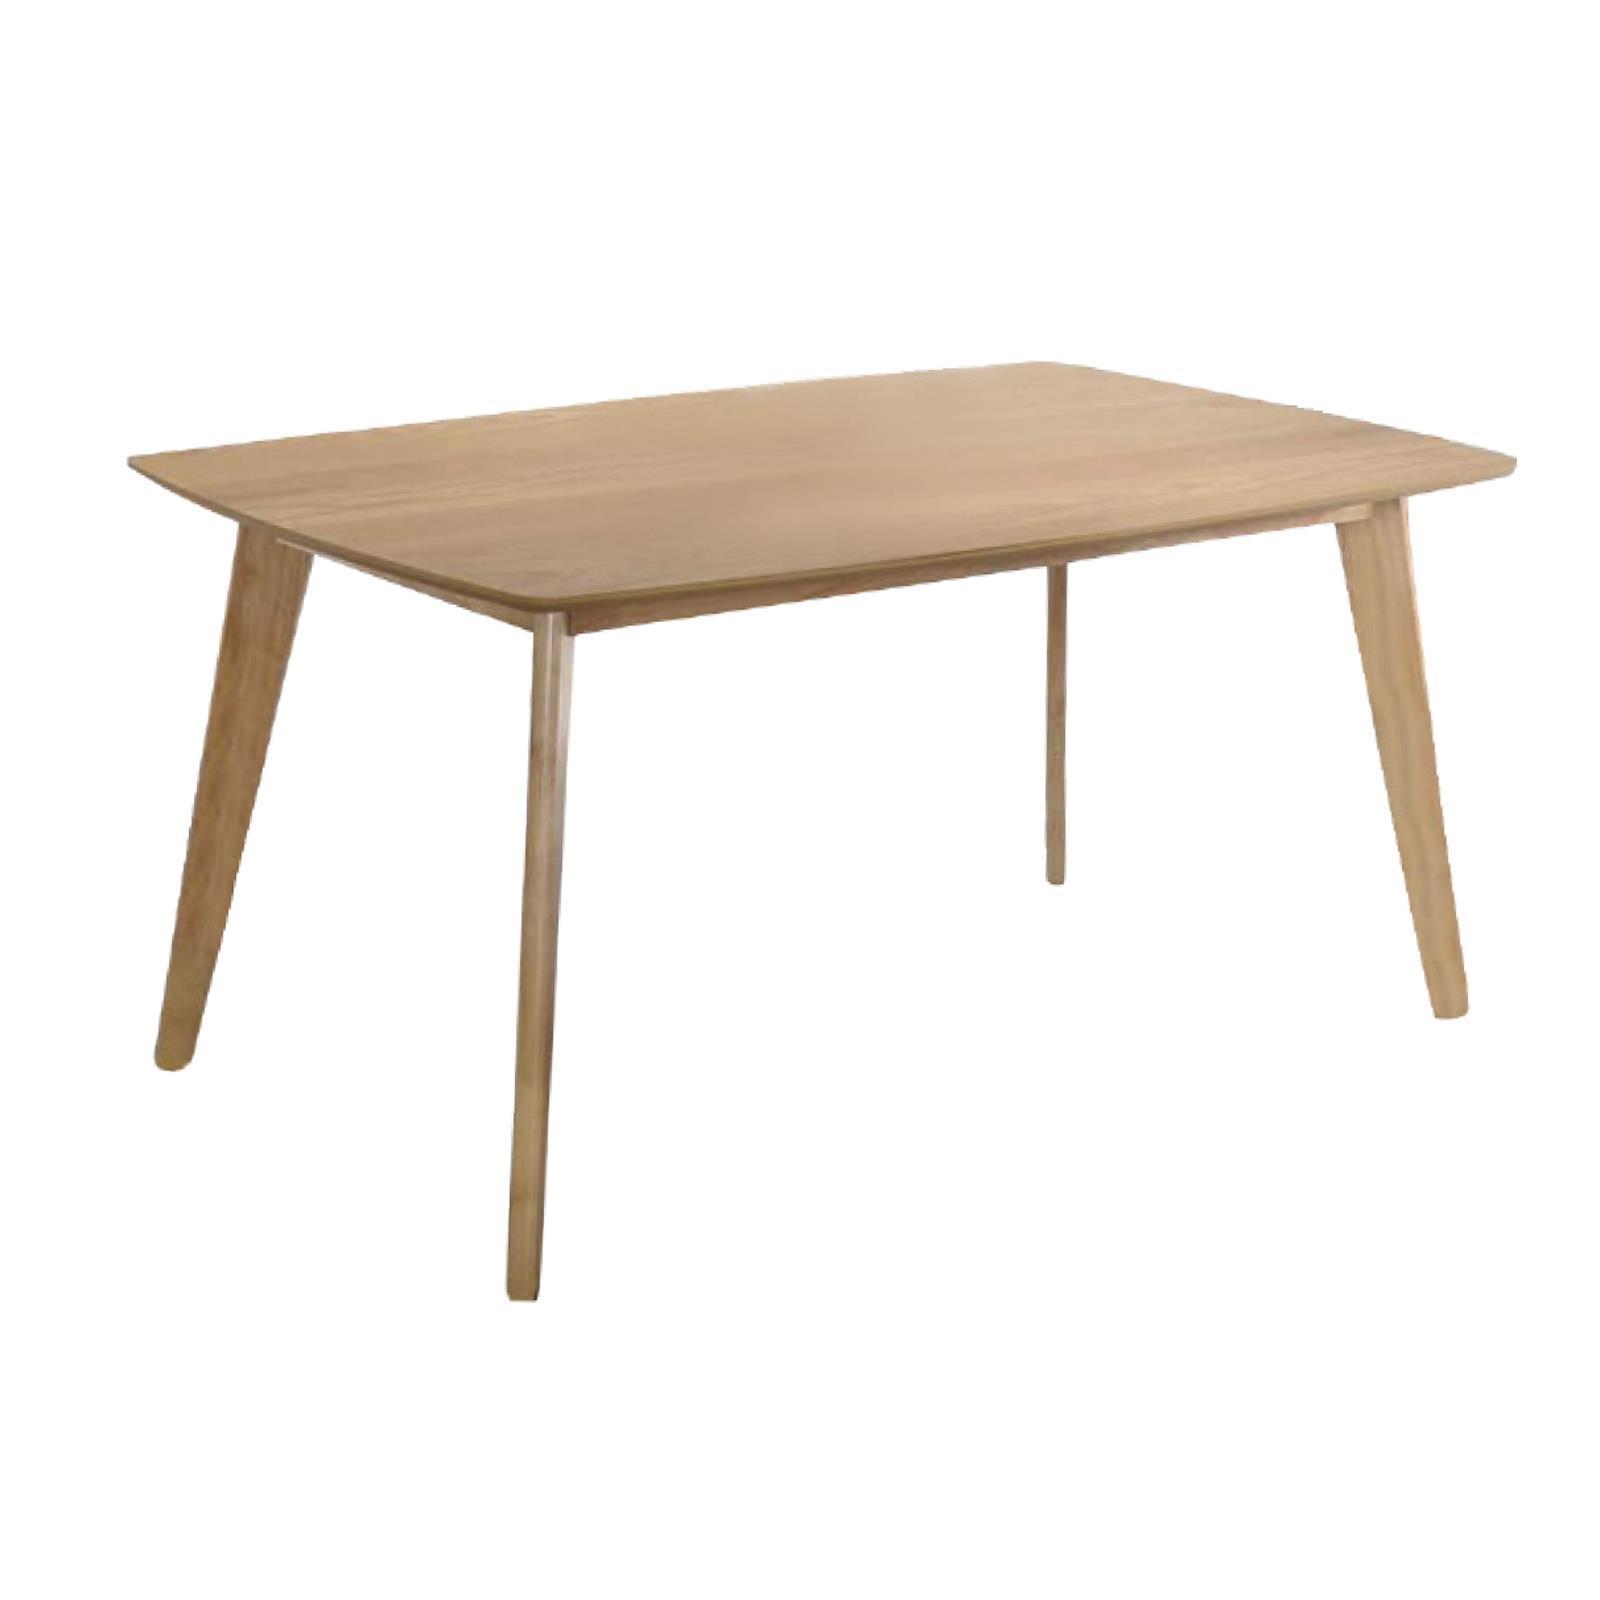 CALVIN τραπέζι τραπεζαρίας φυσικό Υ75x120x80εκ.